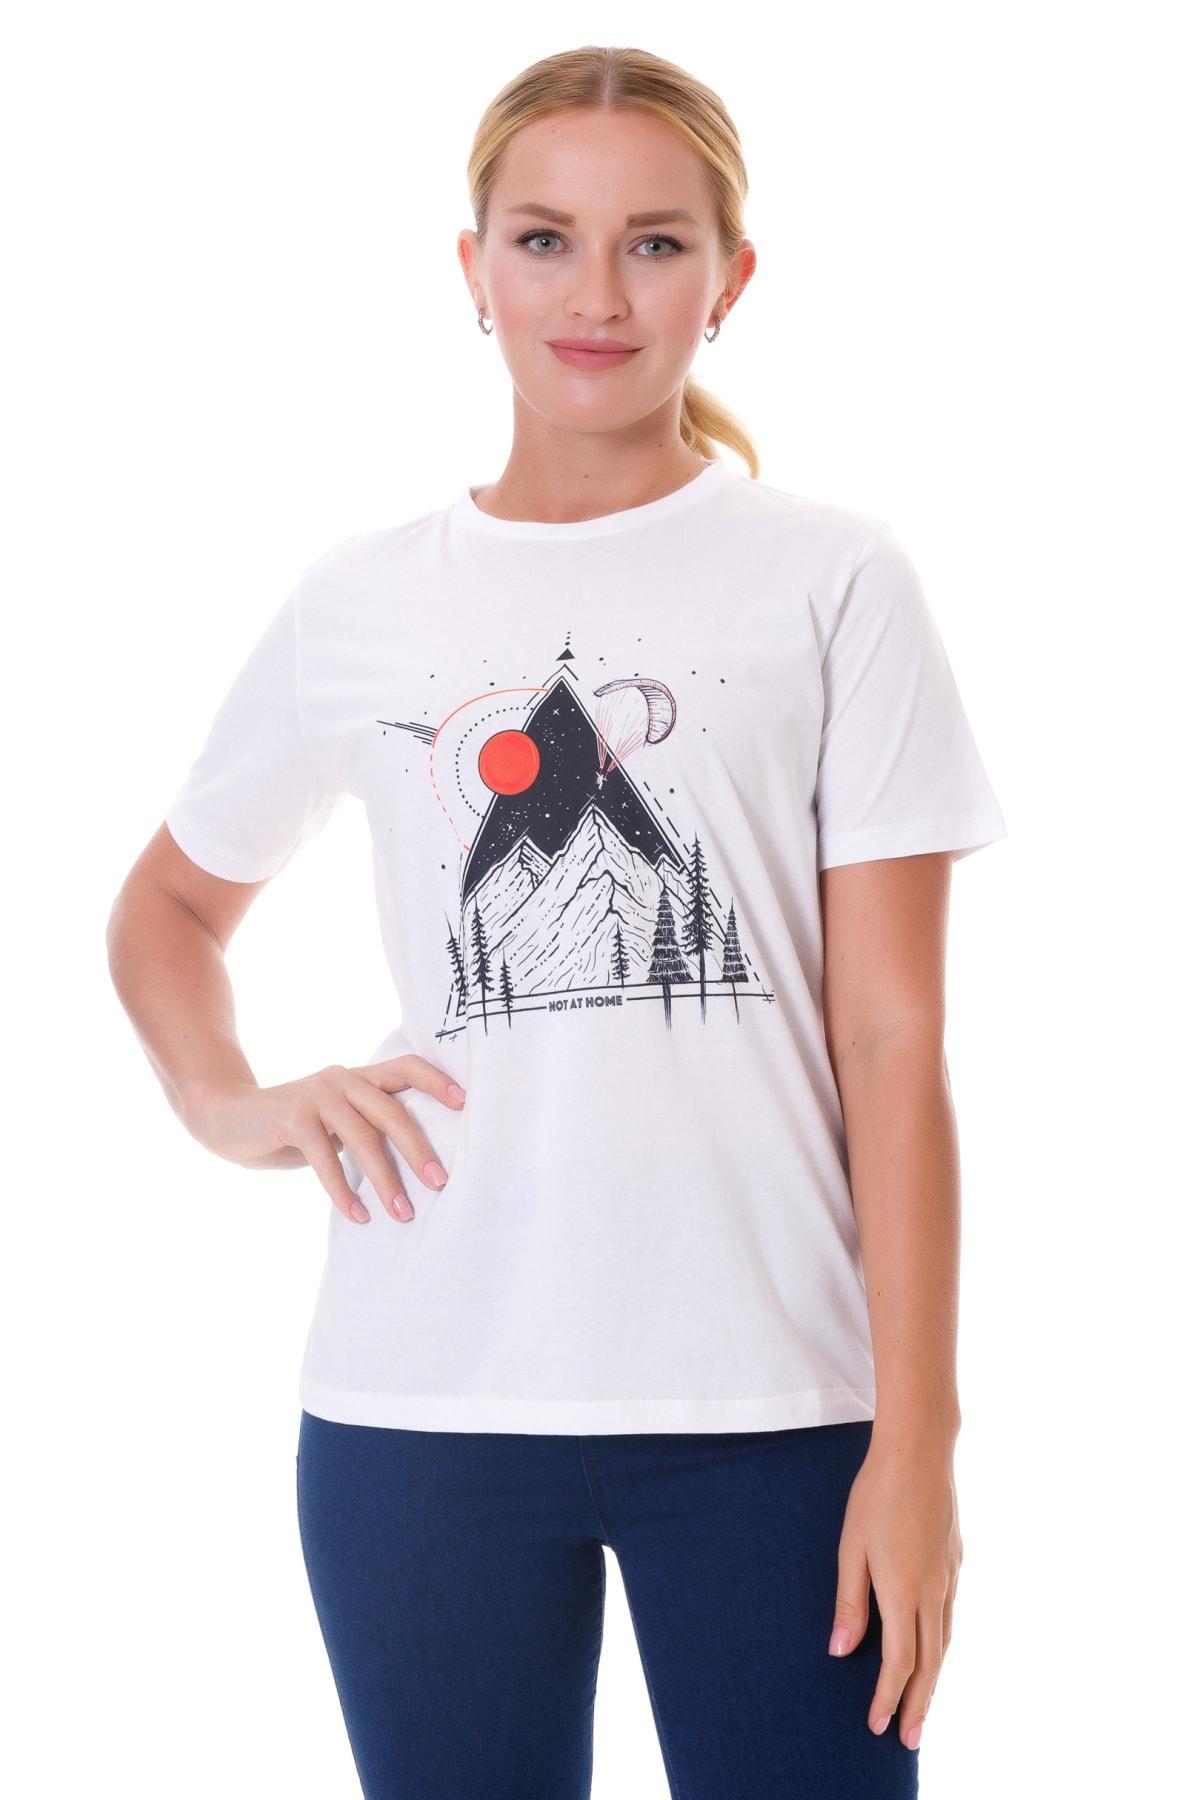 NOT AT HOME Kadın Beyaz Bisiklet Yaka Dağ Desenli T-shirt 1